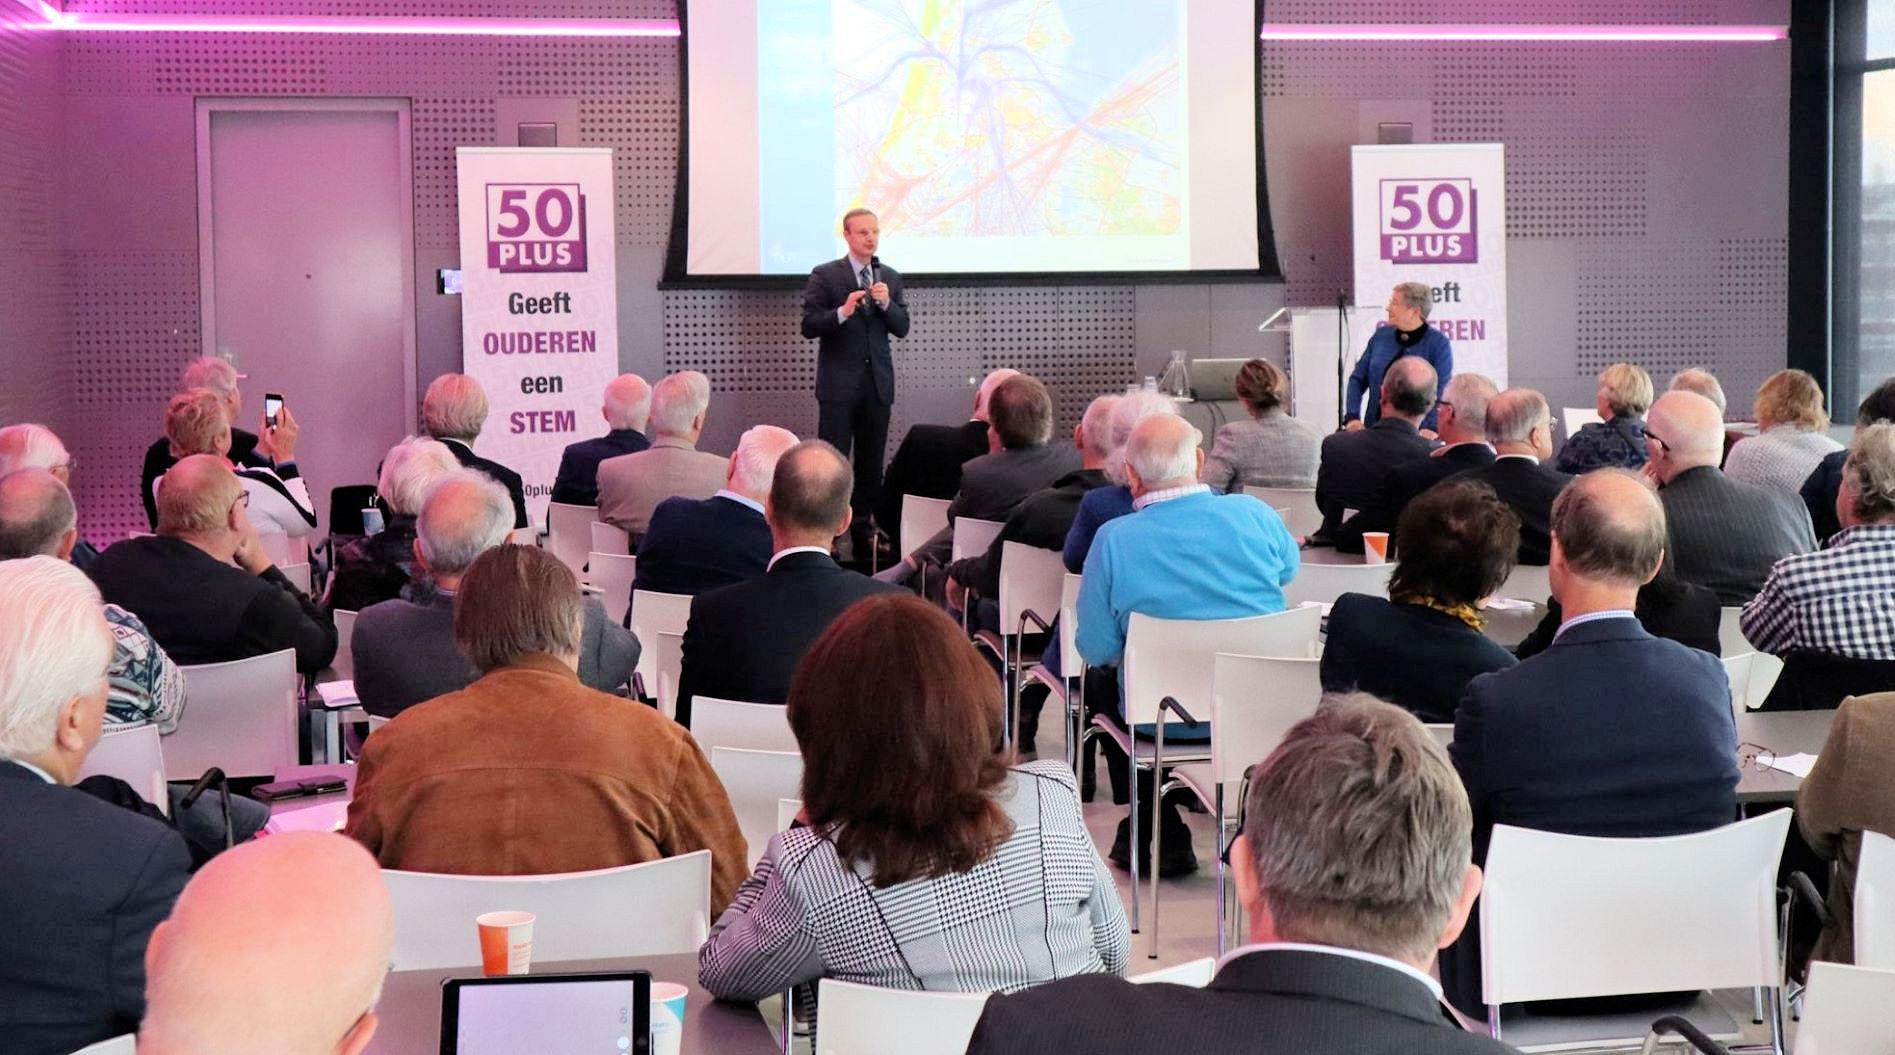 Symposium Wetenschappelijk Instituut 50PLUS